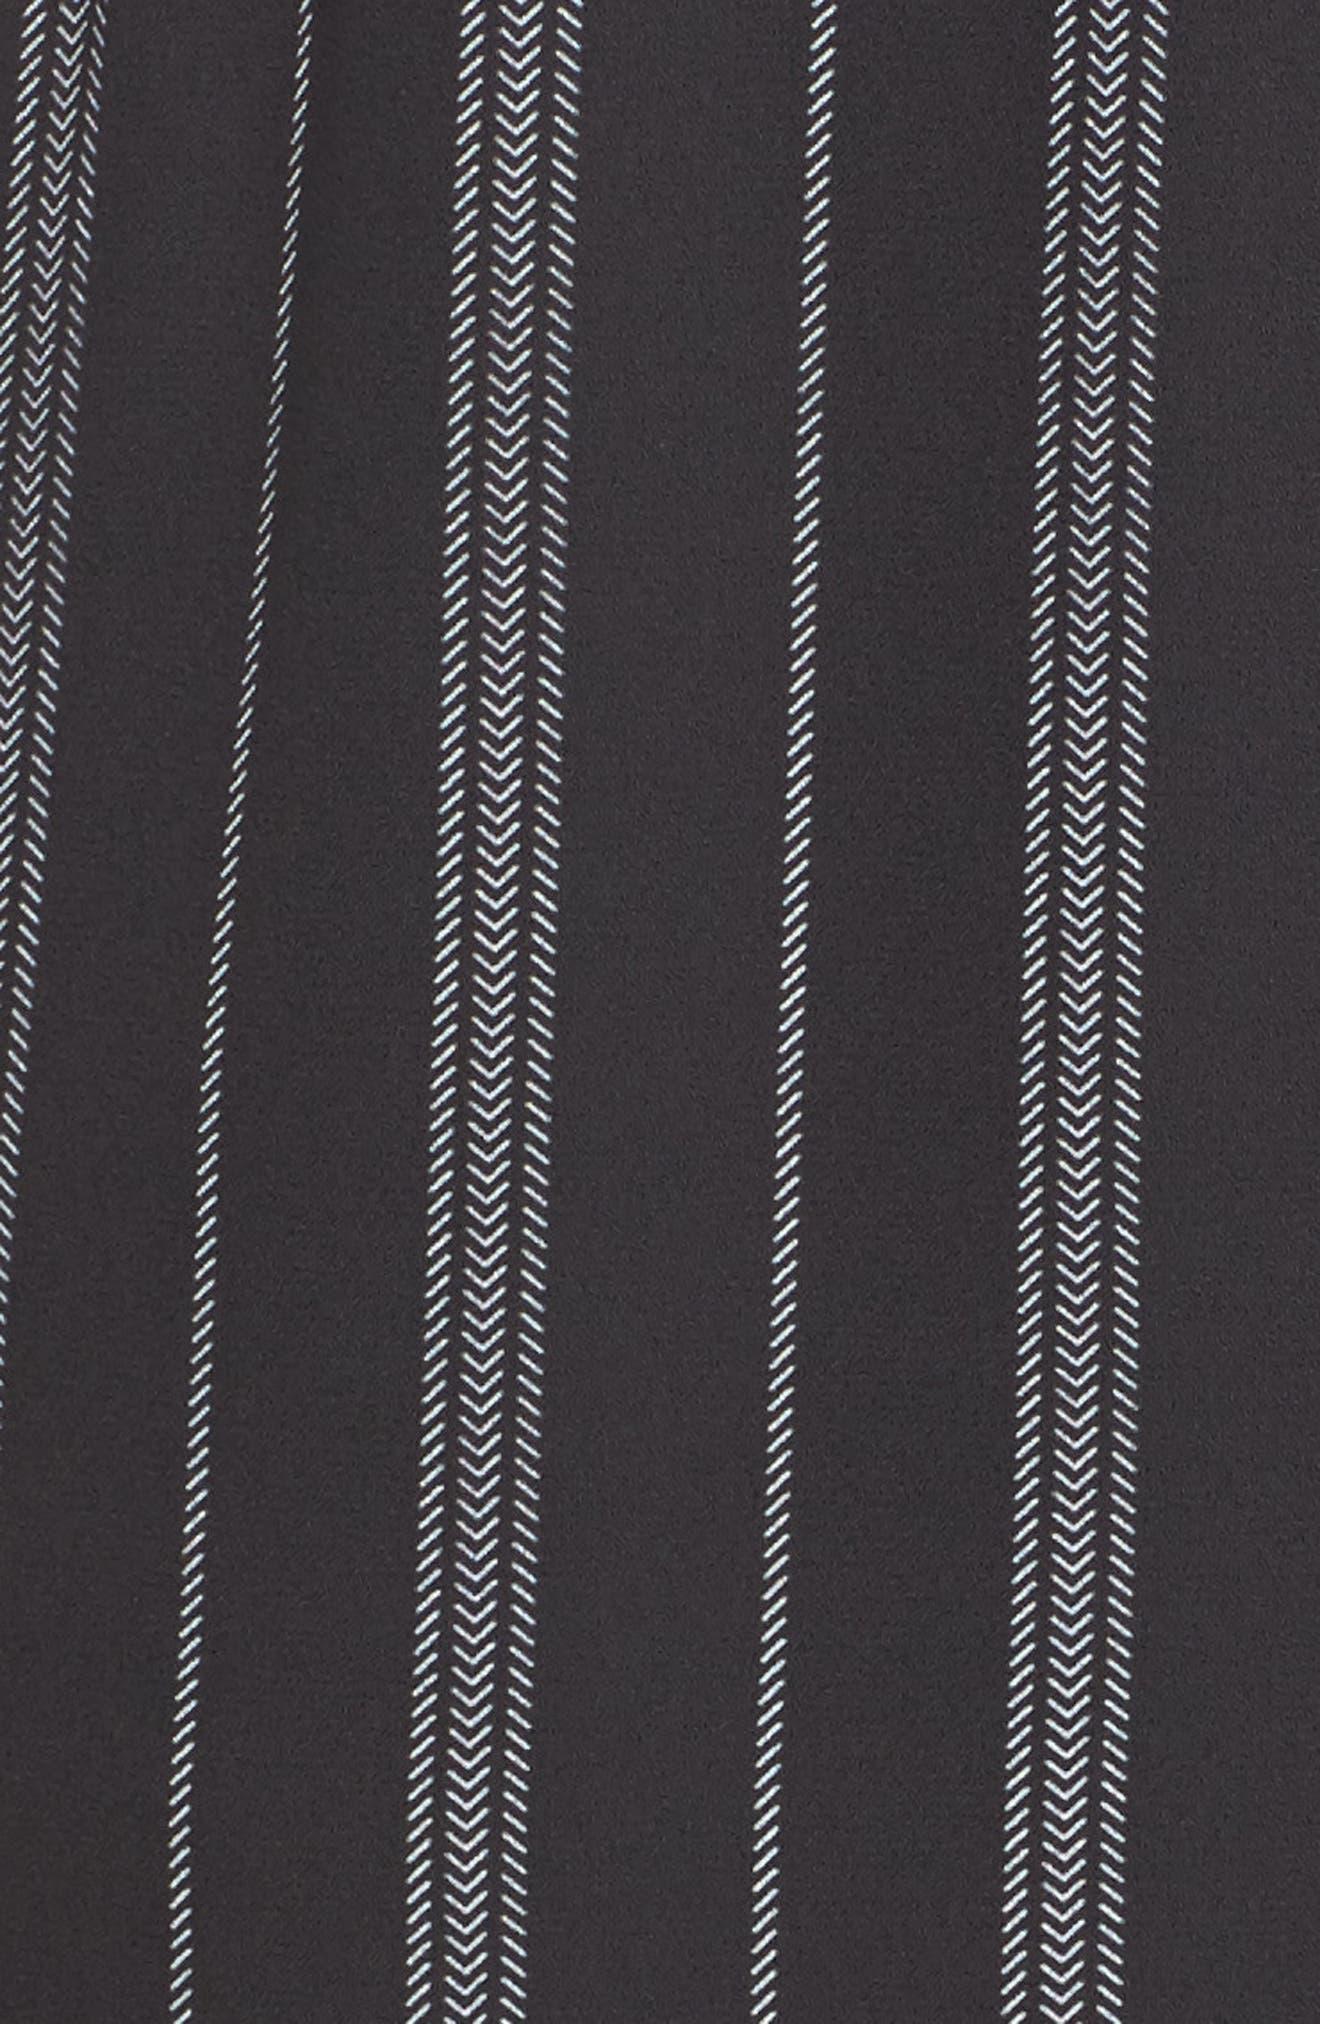 ALI & JAY, Poolside Periodicals Crop Top & Culottes Set, Alternate thumbnail 5, color, 651